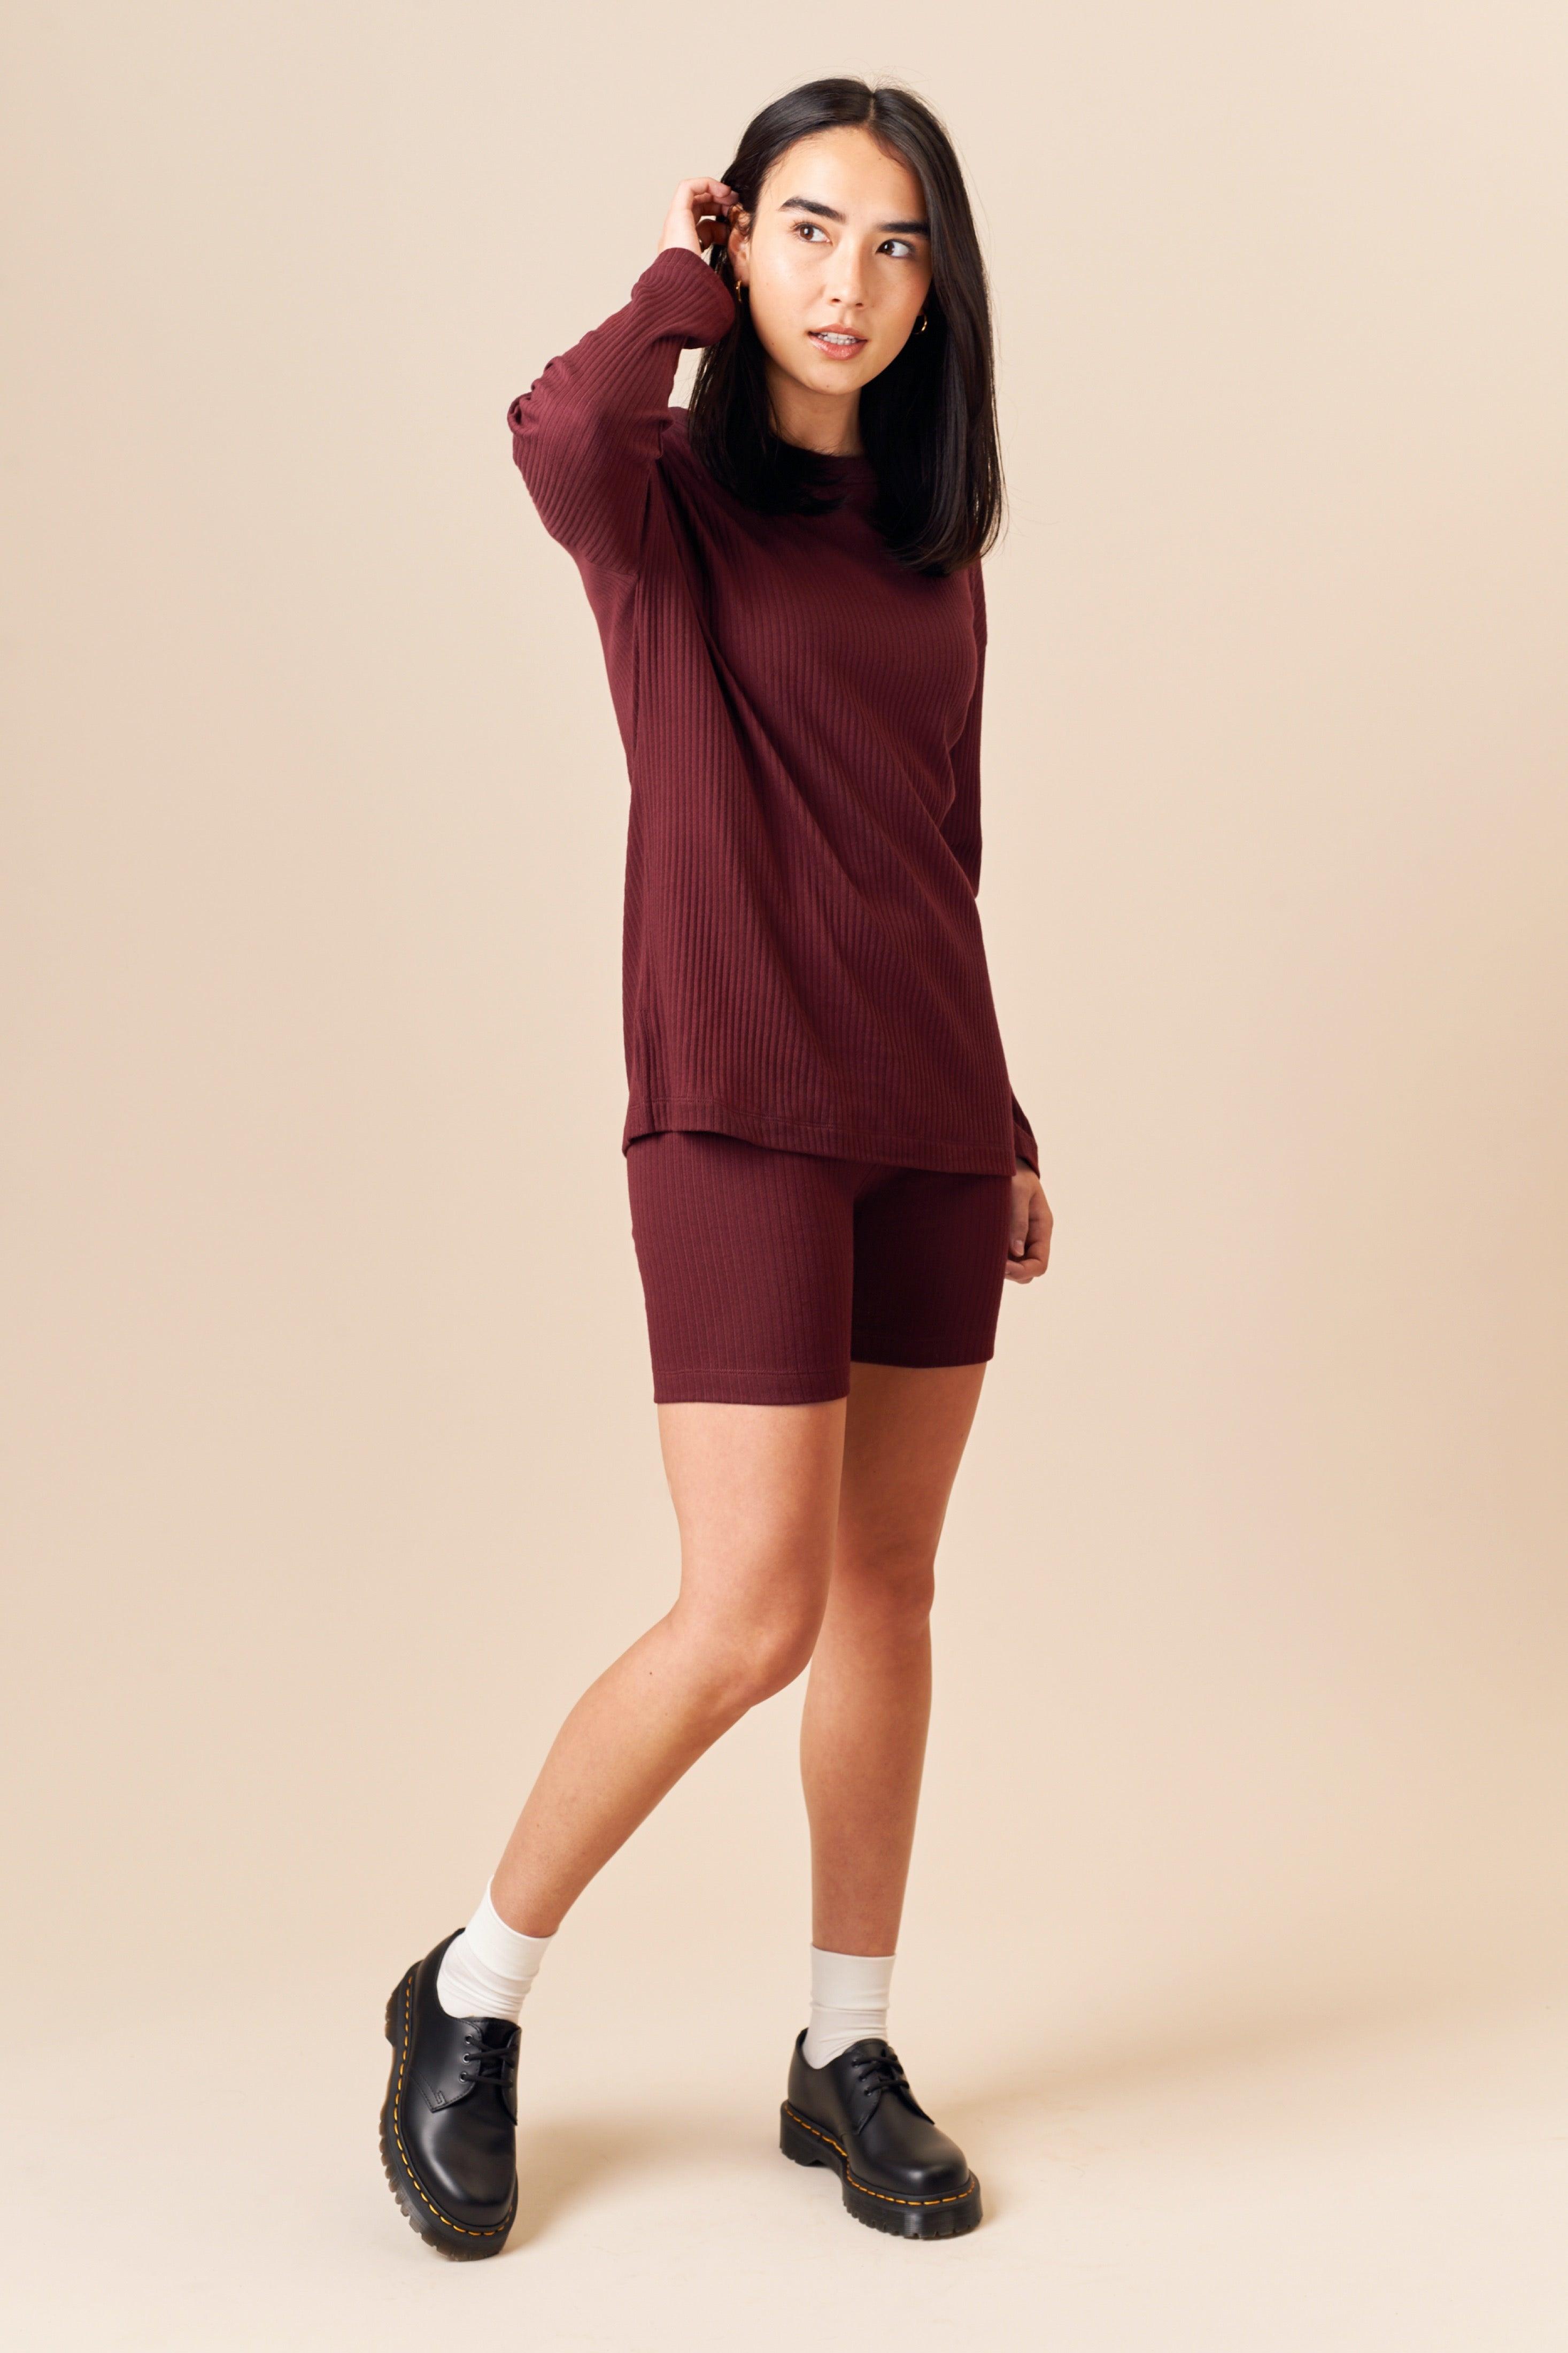 Kotn Women's Ribbed Shorts in Zinfandel, Size 2XL